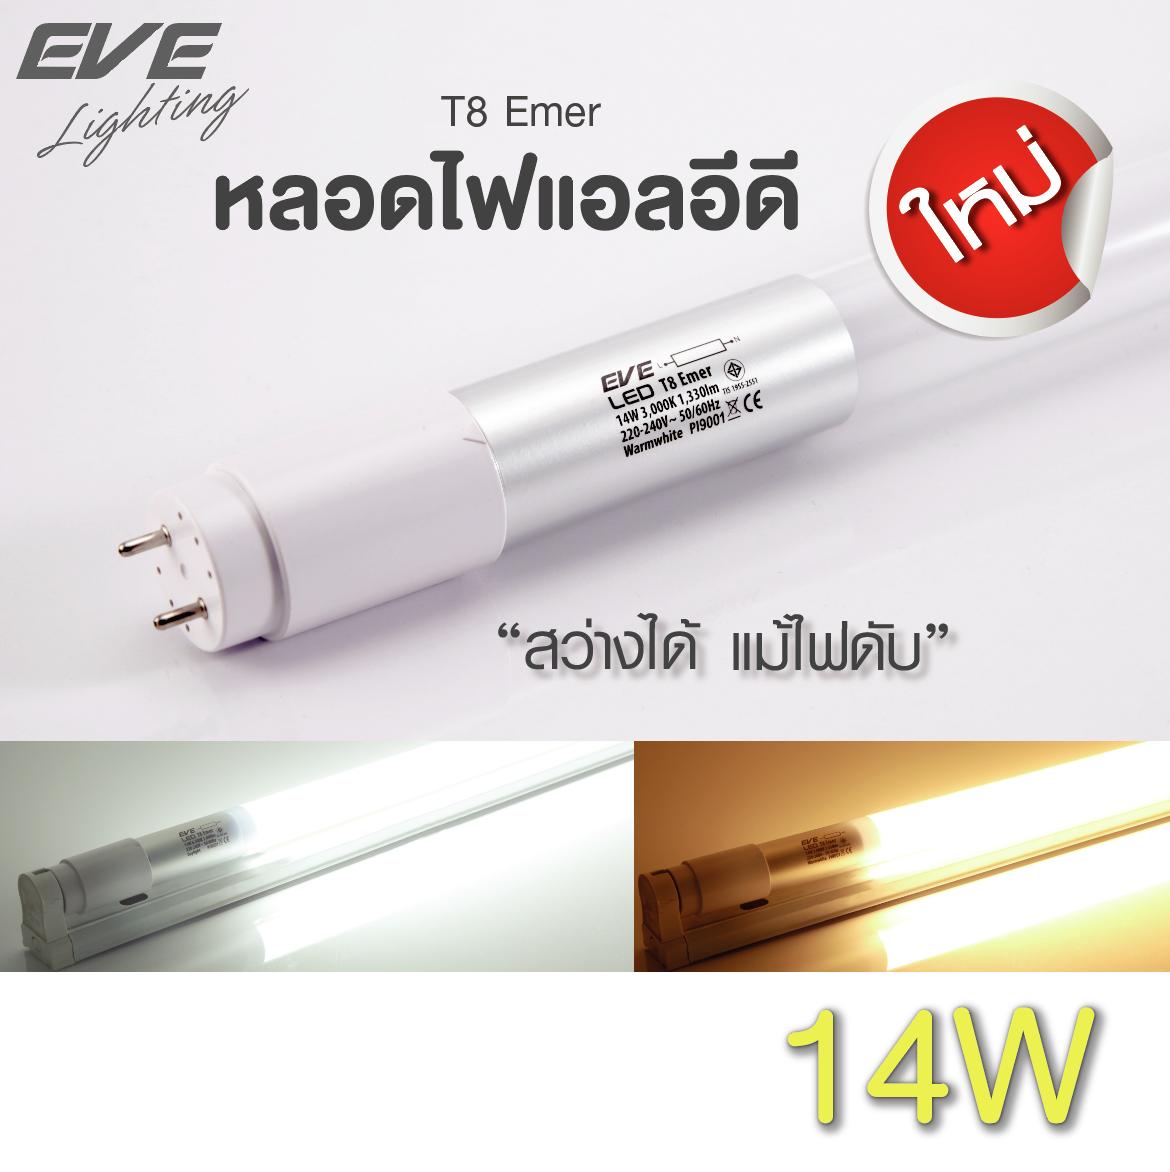 LED T8 Emergency Tube หลอดแอลอีดี T8 พร้อมแบตเตอรี่ในตัว ติดอัตโนมัติเมื่อไฟดับ ขนาด 14 วัตต์ แสงขาวเดย์ไลท์ และ วอร์มไวท์